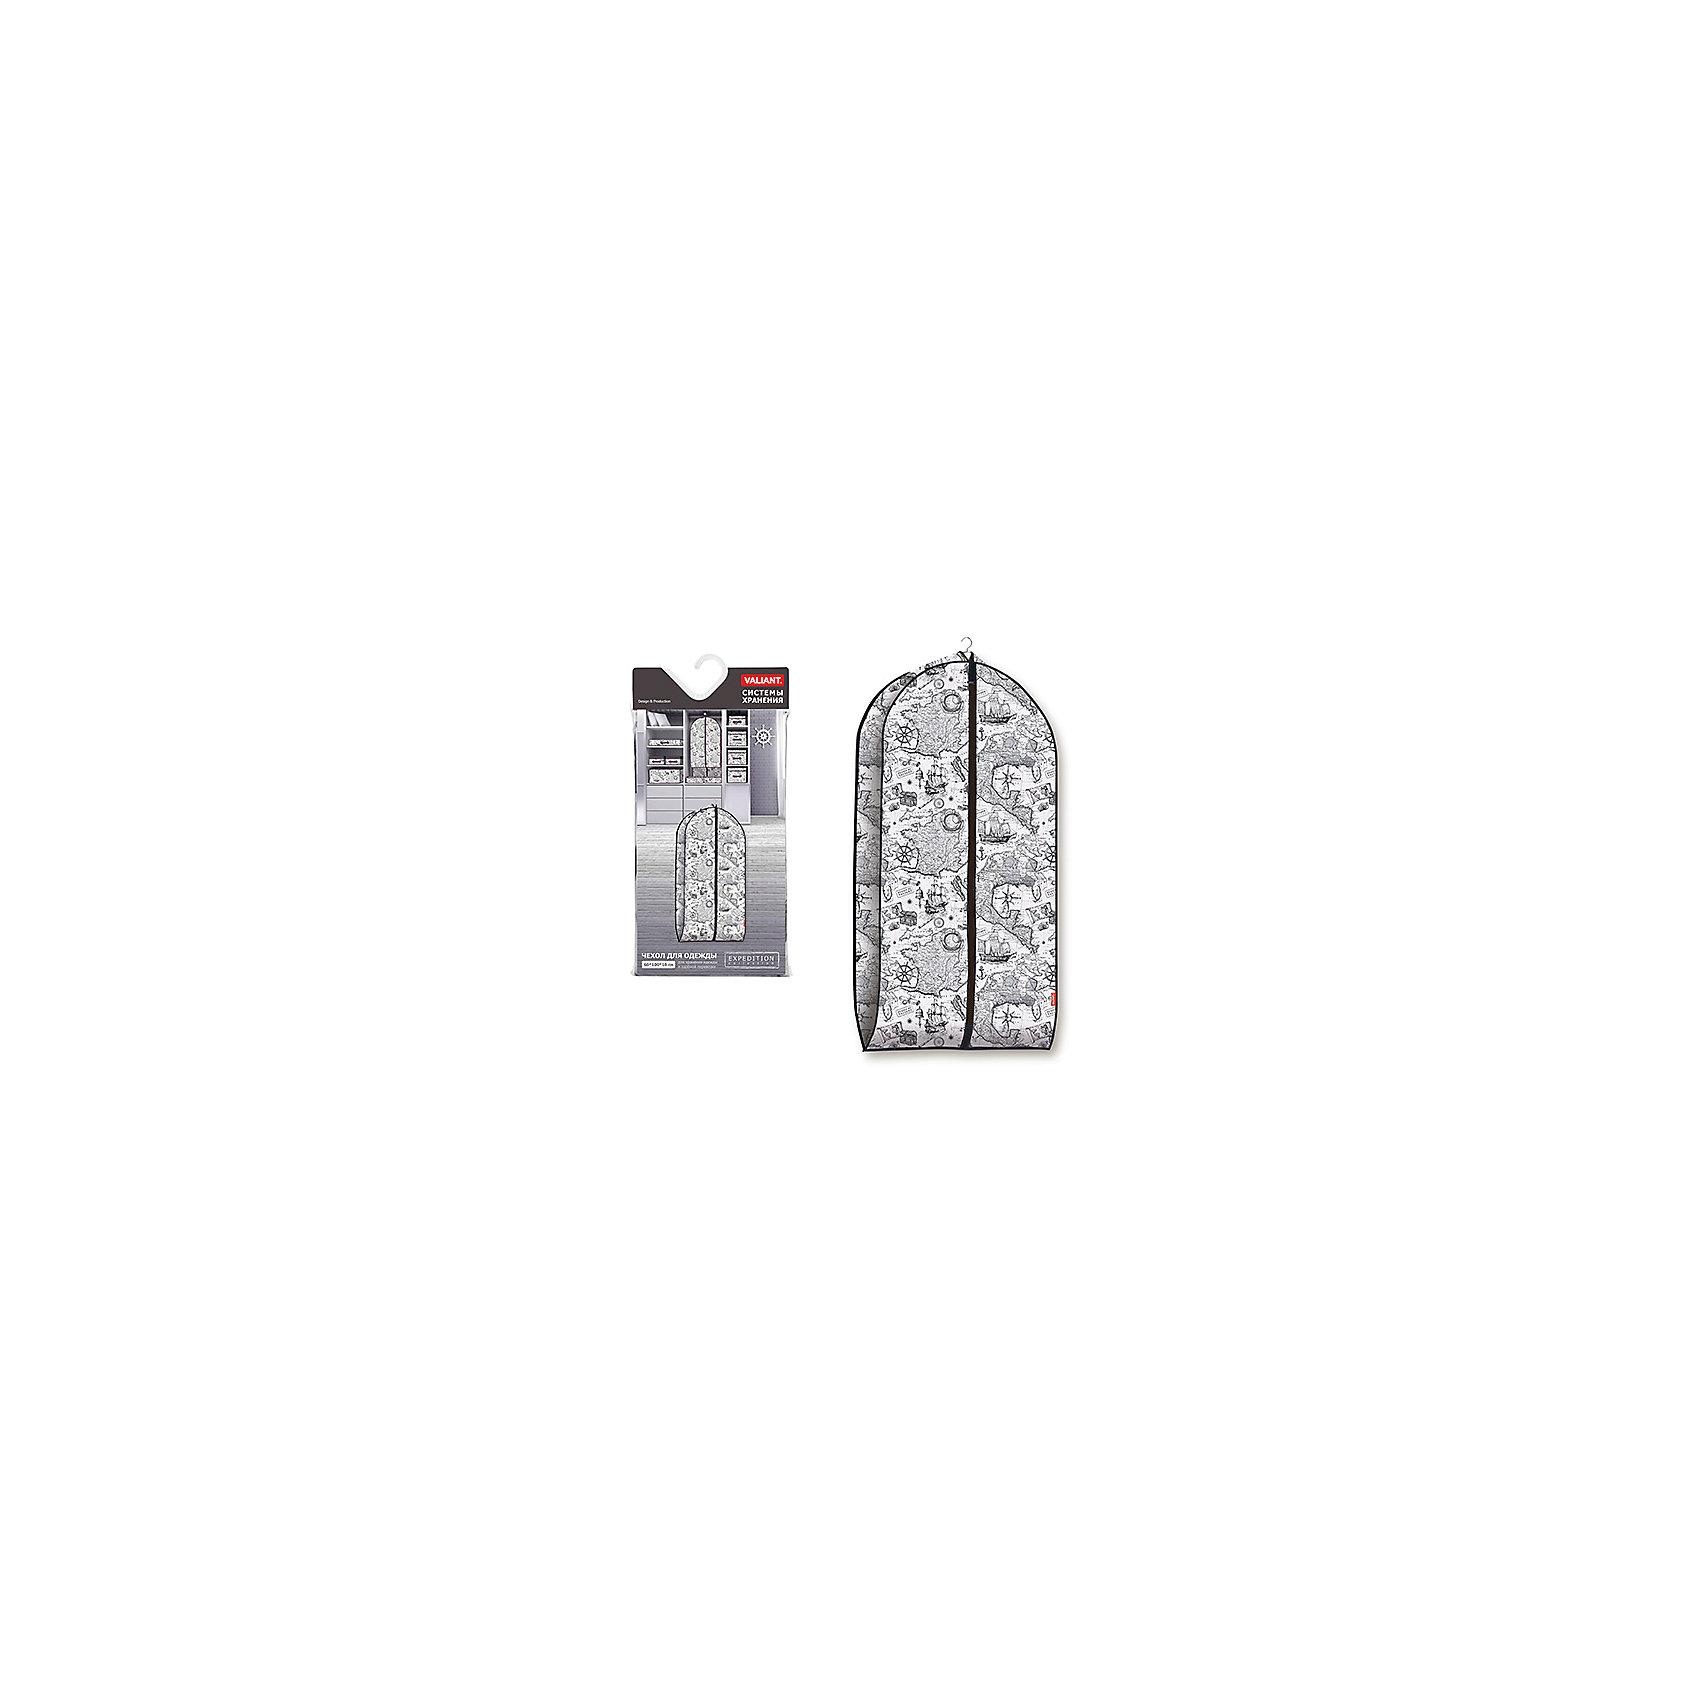 VALIANT Чехол для одежды объемный, малый, 60*100*10 см, EXPEDITION, Valiant